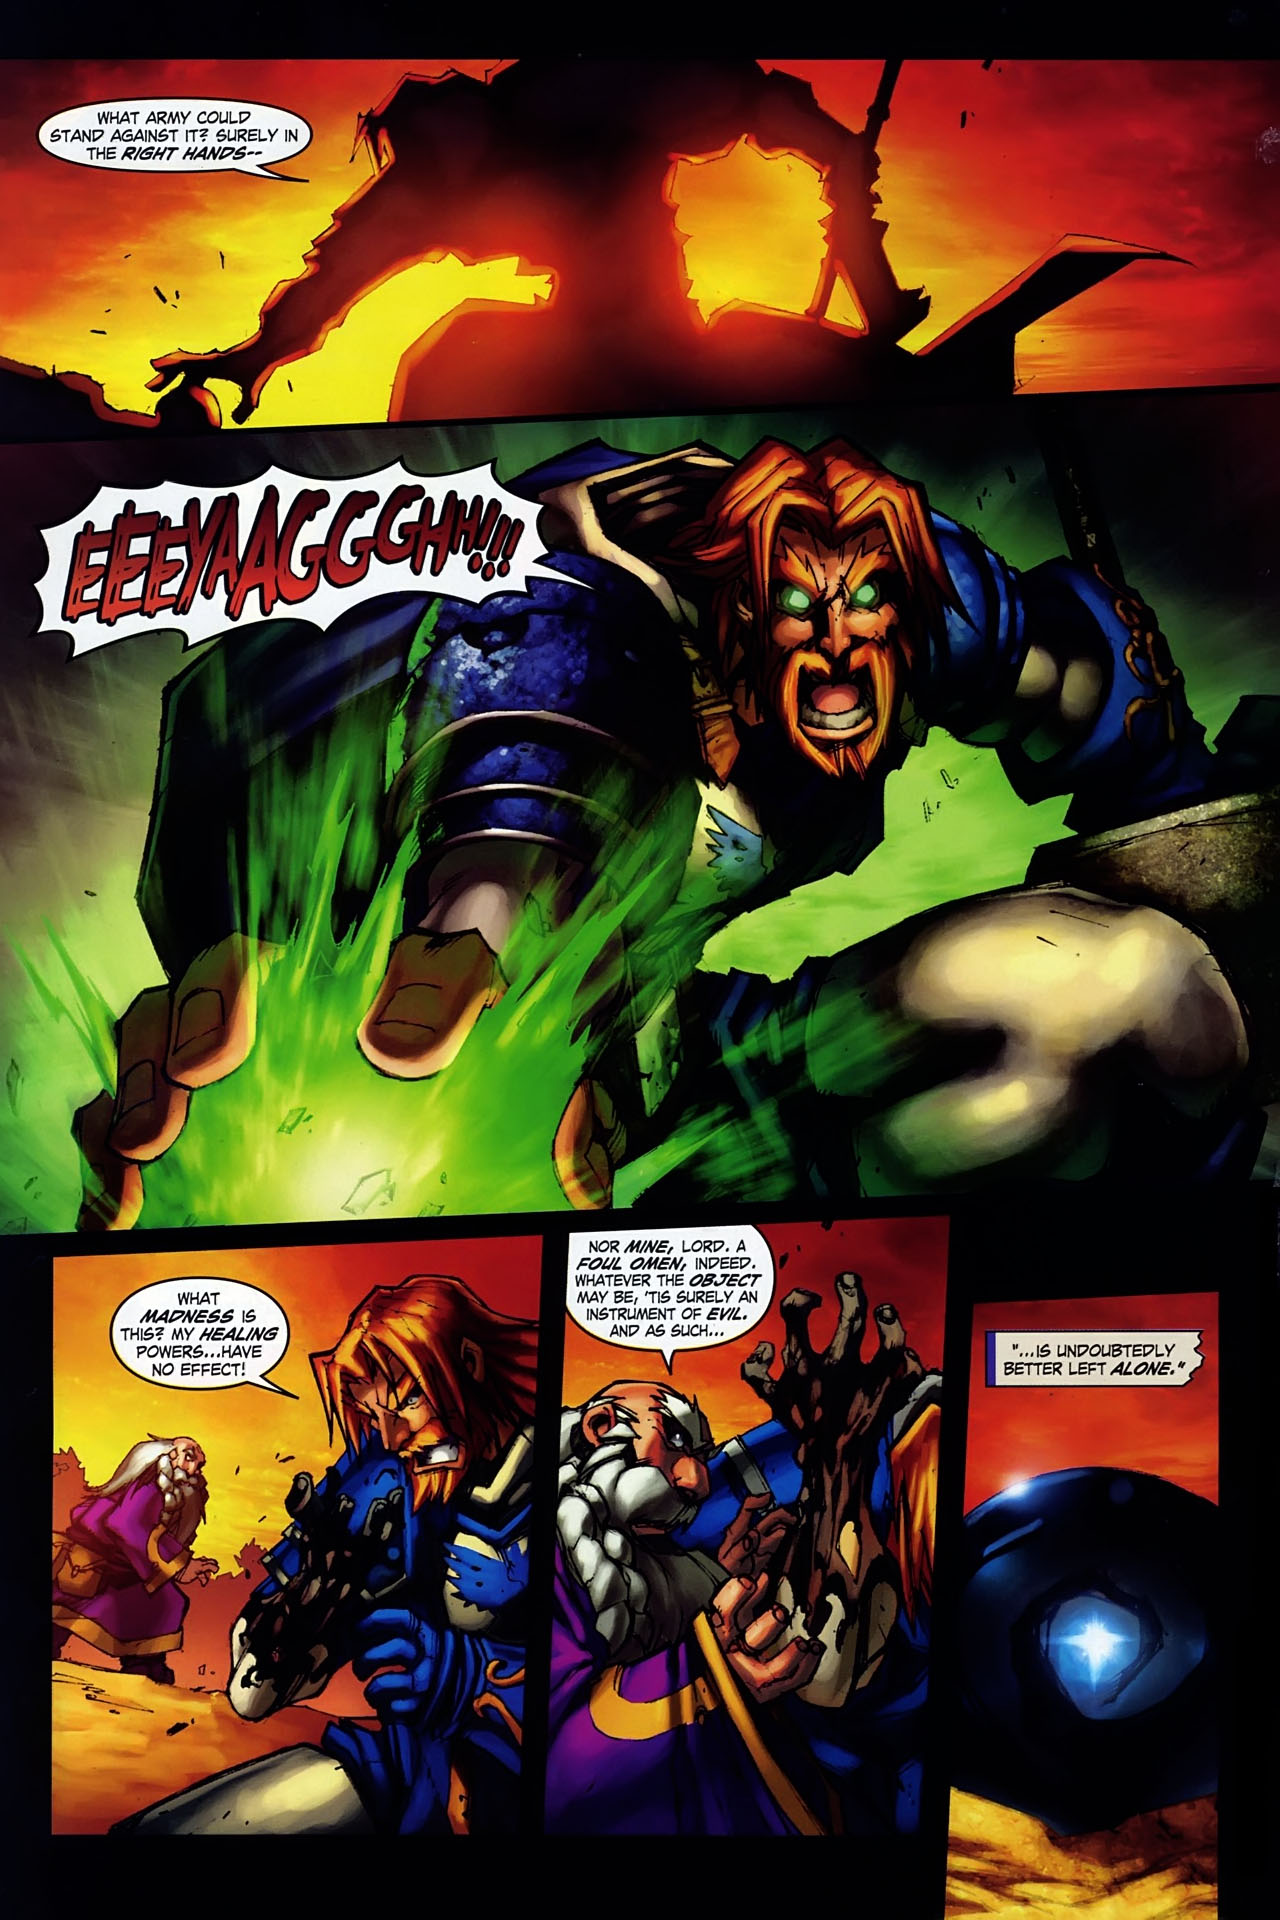 Read online World of Warcraft: Ashbringer comic -  Issue #1 - 7